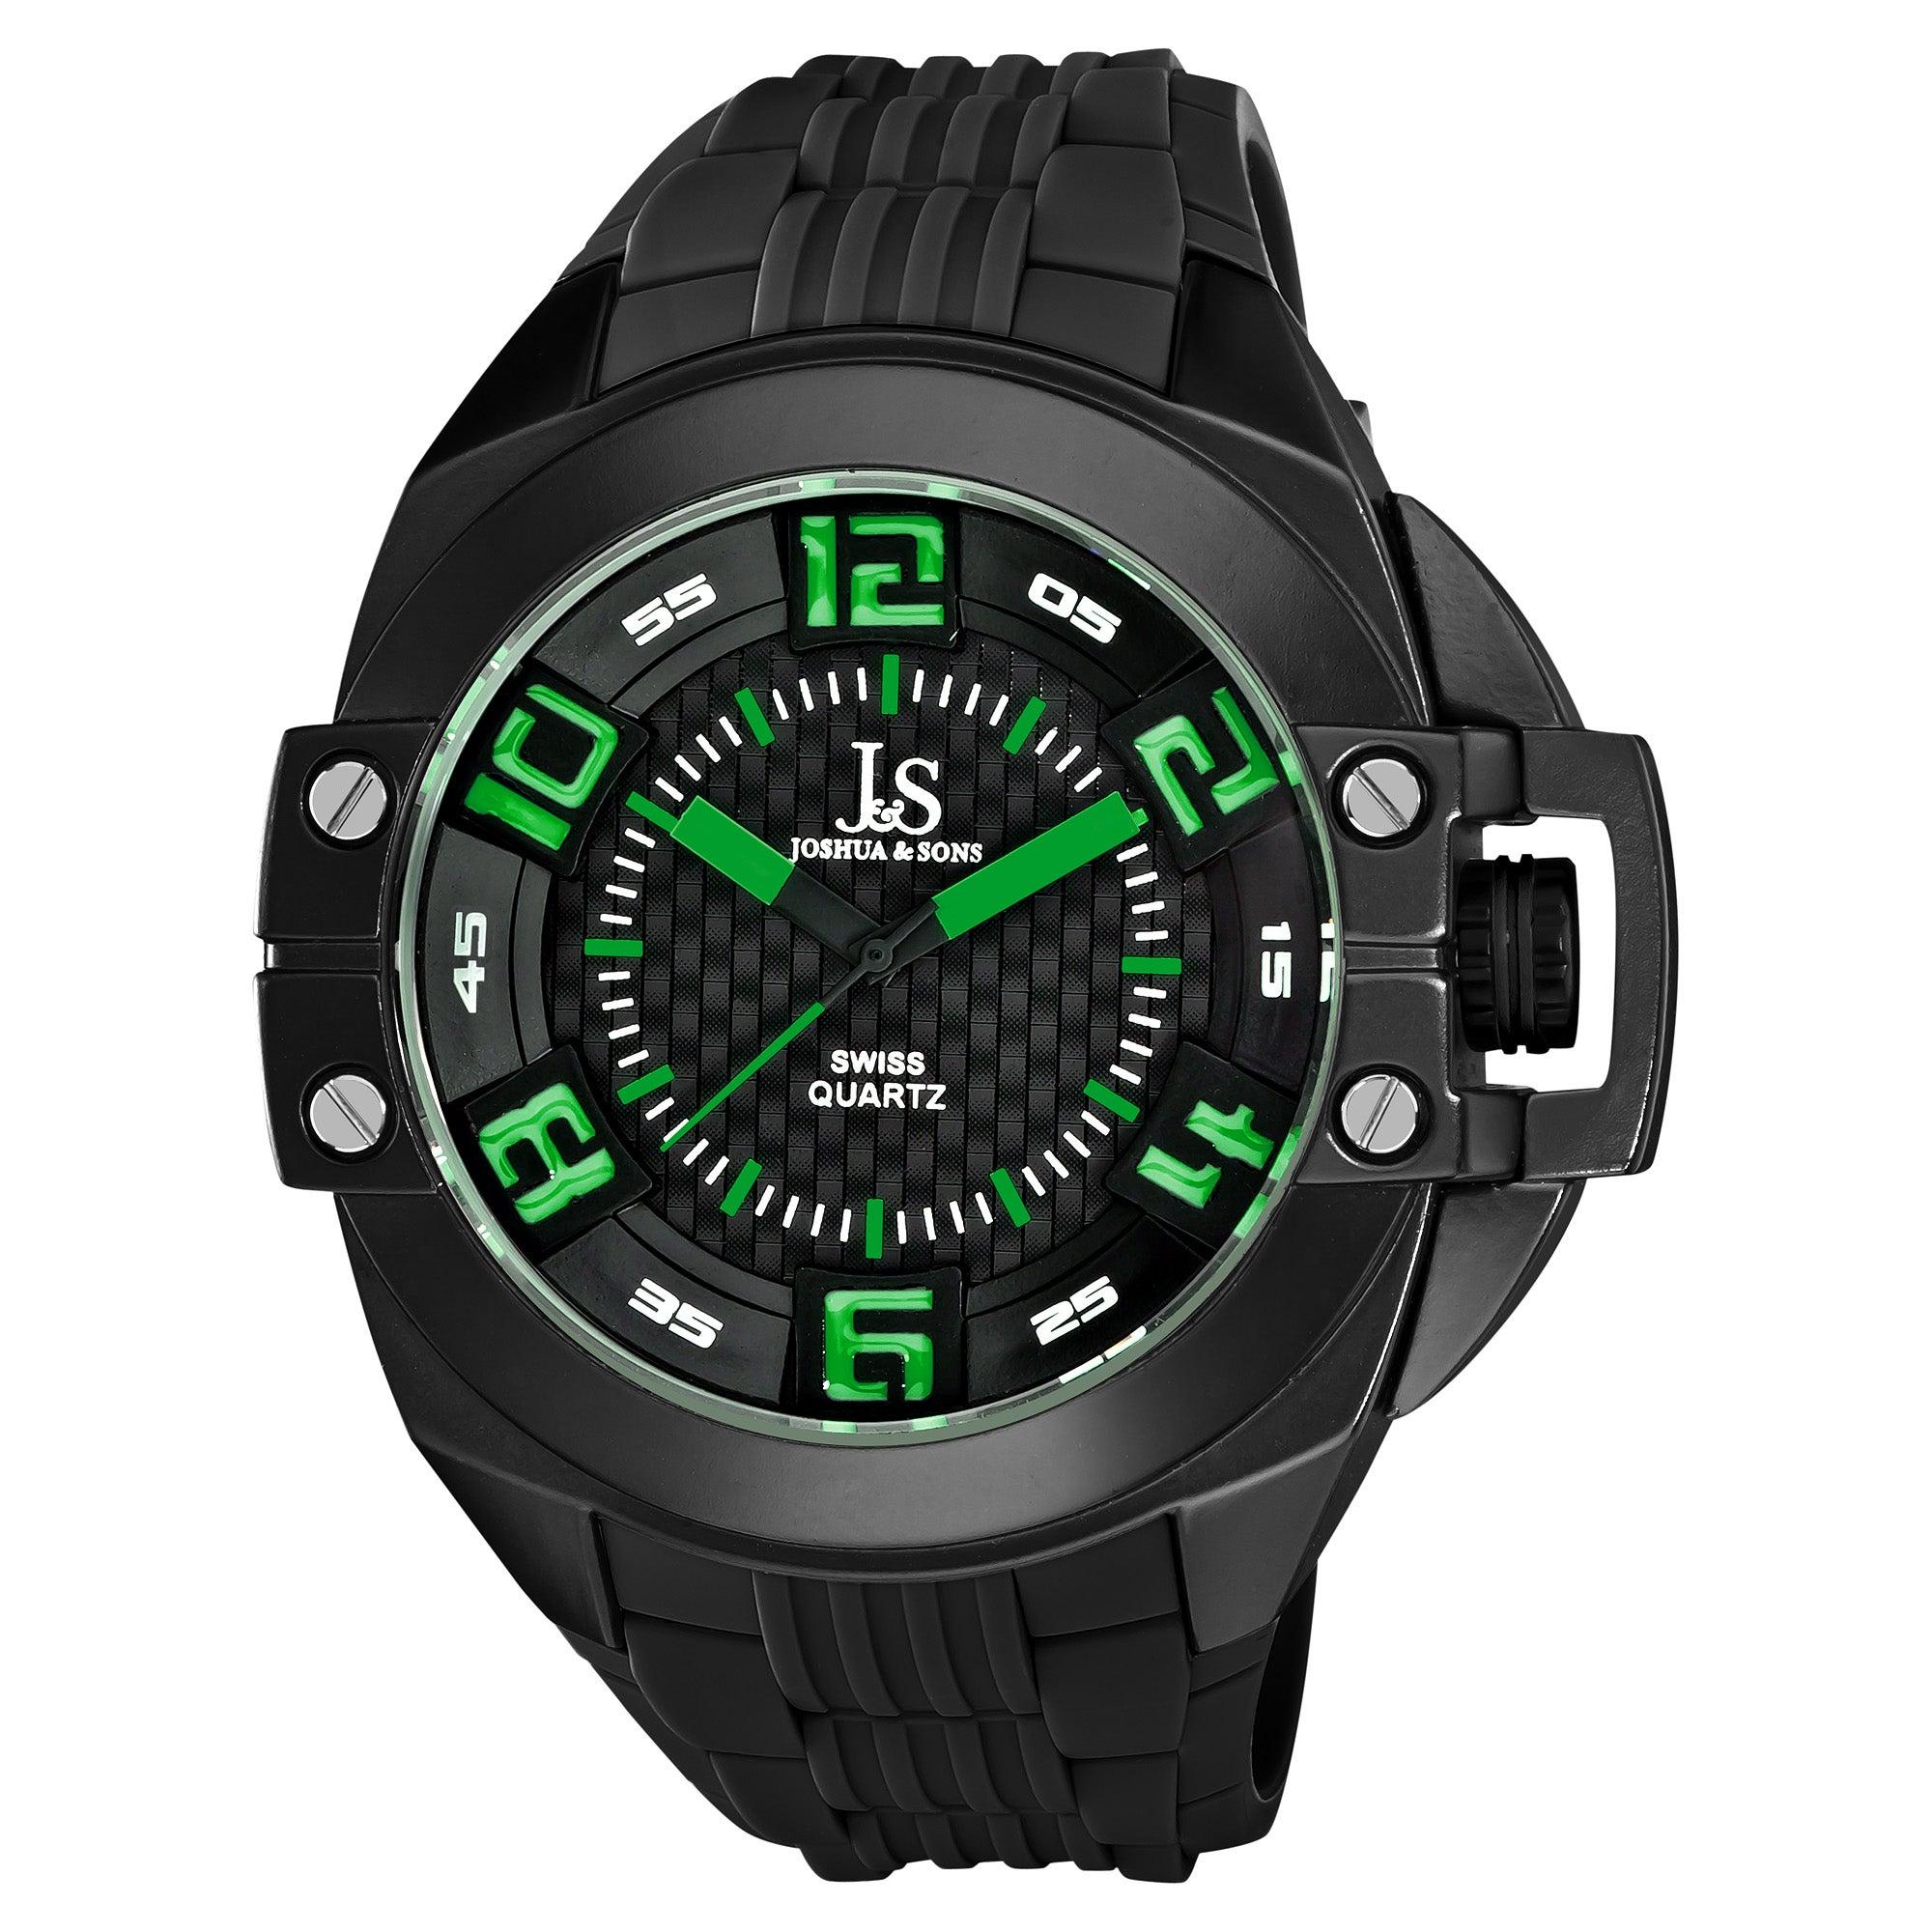 Joshua & Sons Black Men's Swiss Quartz Silicon Strap Crown Guard Watch